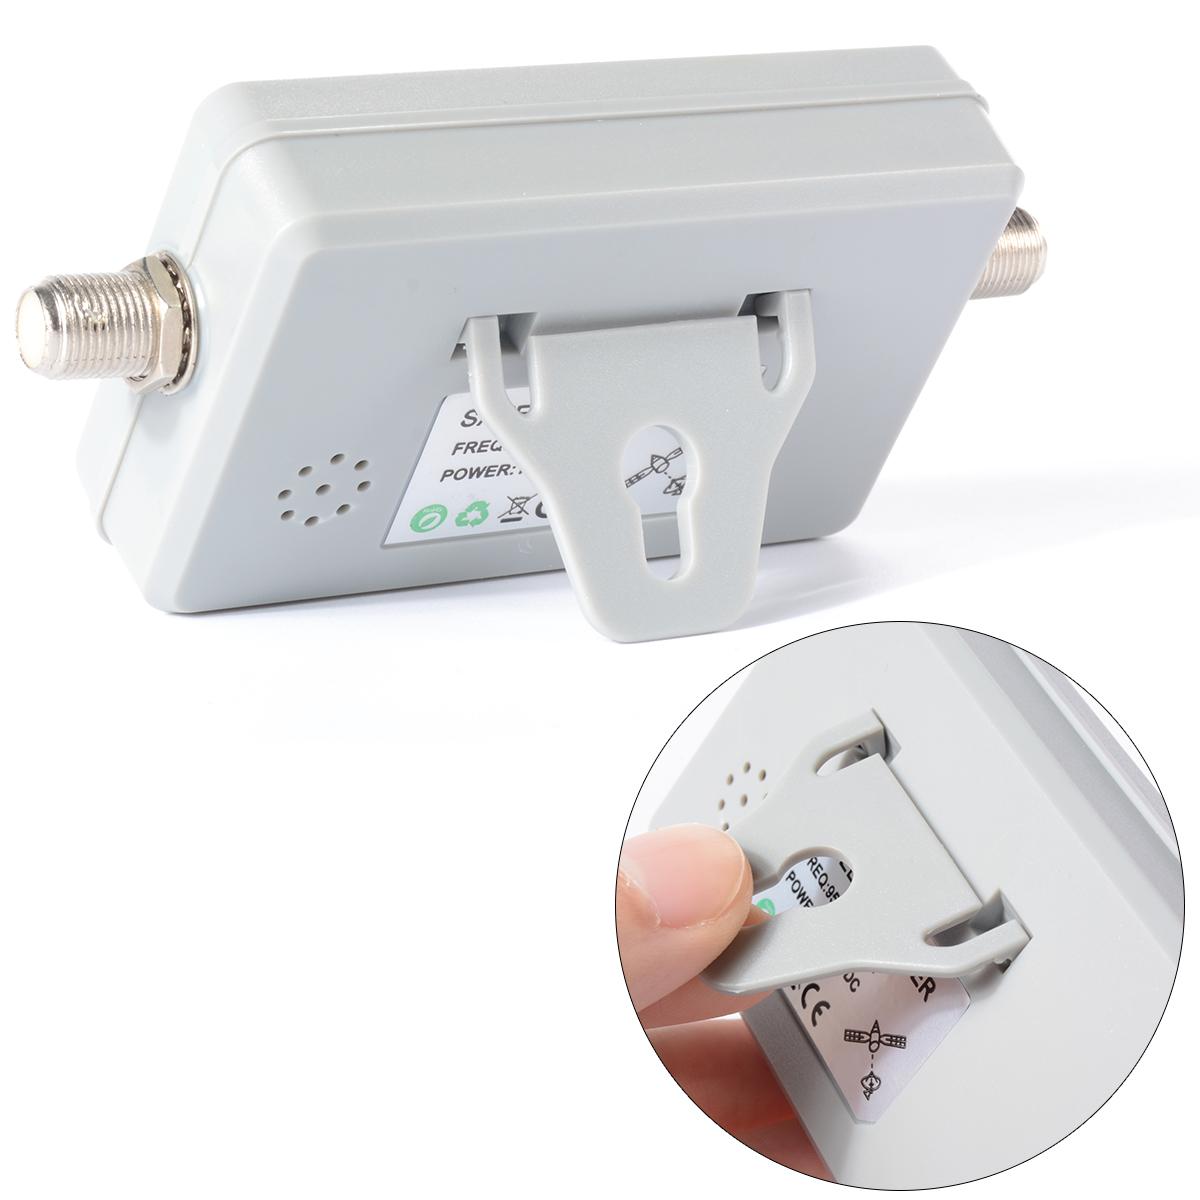 WS-6903 DVB-S FTA Satellite Signal Finder sat Meter LCD TV Dish DirecTV 13-18V BI017+(China (Mainland))